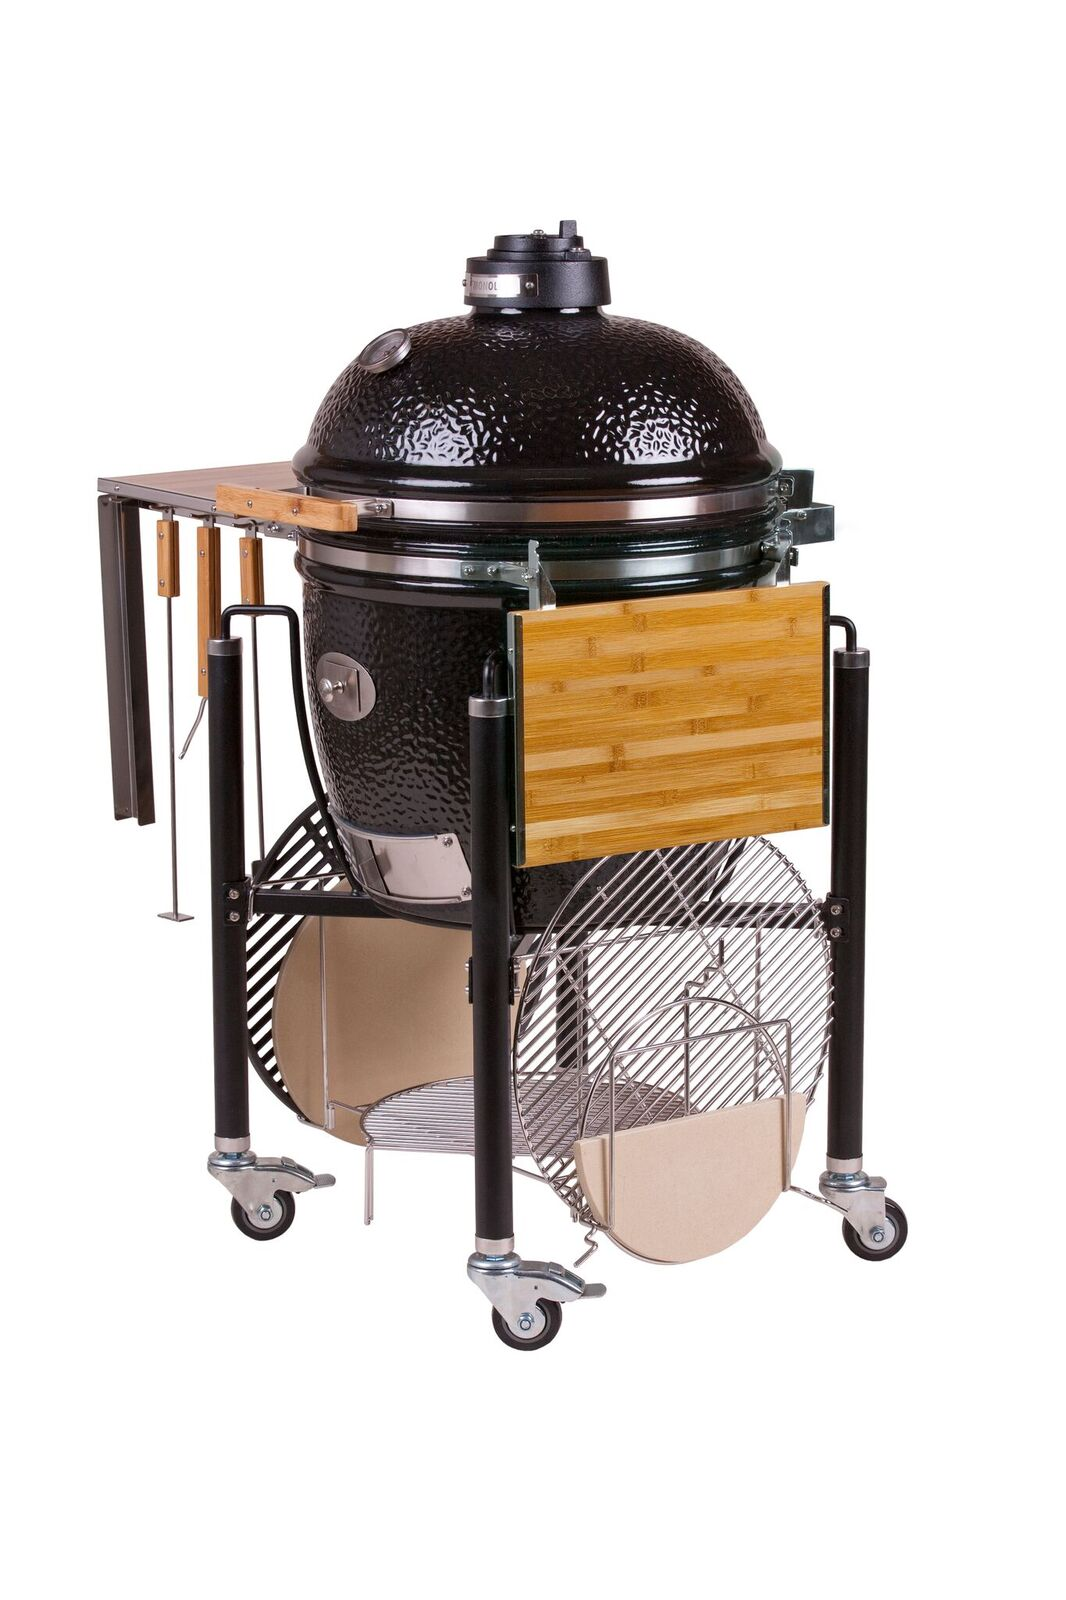 Wood Pellet Barbecue Bargains & Accessories Sale 2019